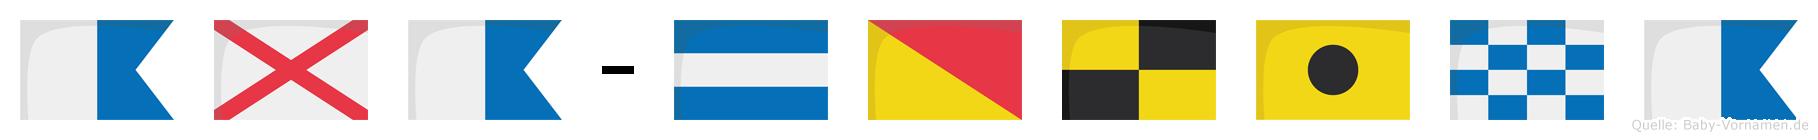 Ava-Jolina im Flaggenalphabet